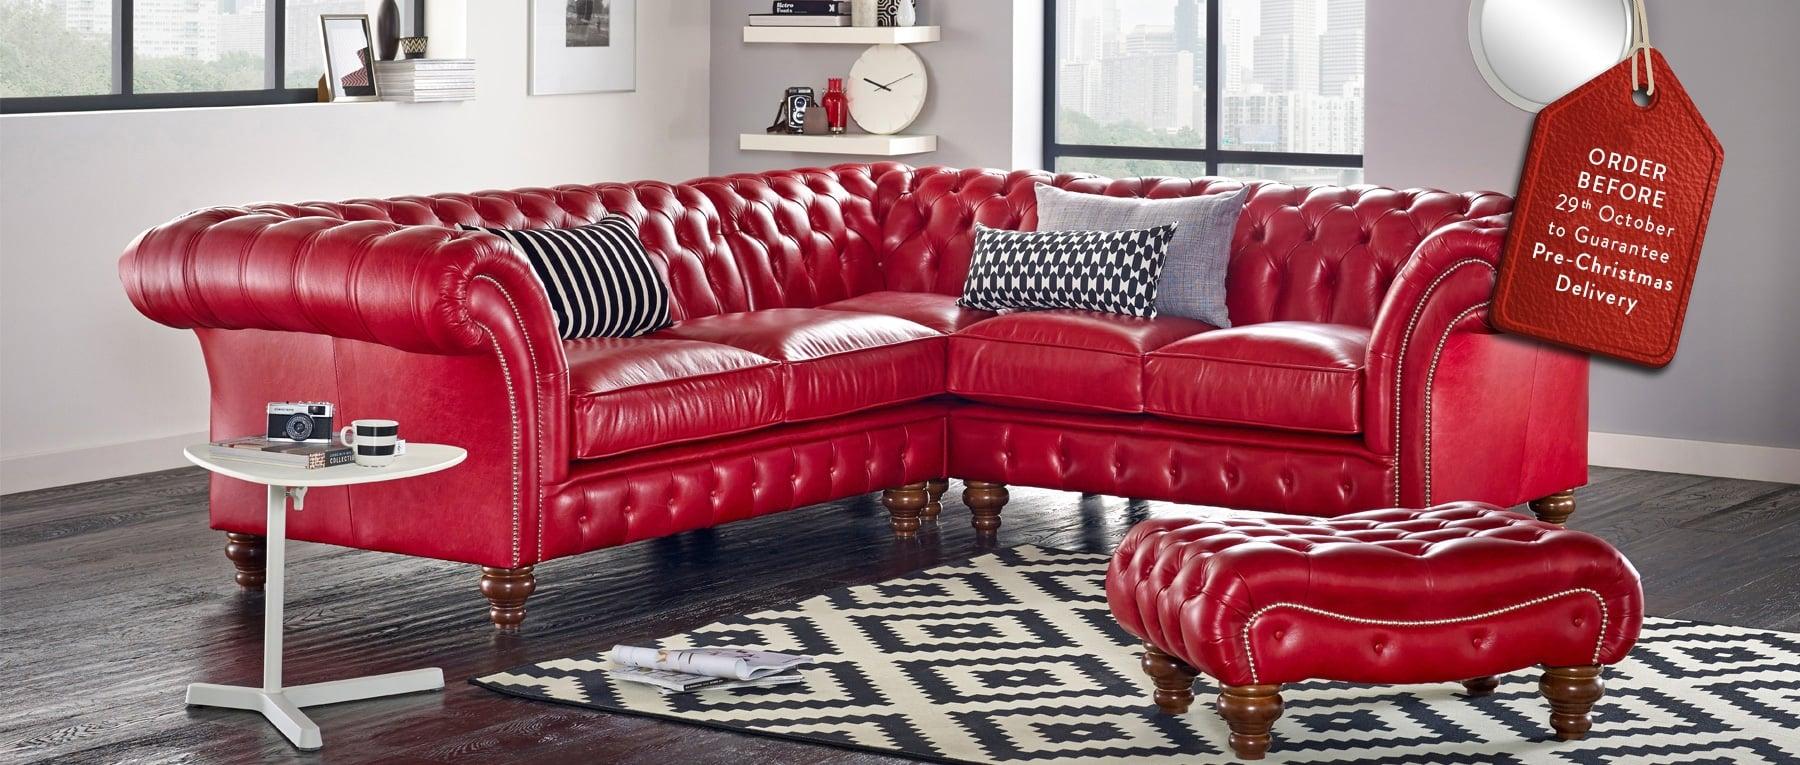 bespoke chesterfield furniture handmade in britain sofas. Black Bedroom Furniture Sets. Home Design Ideas